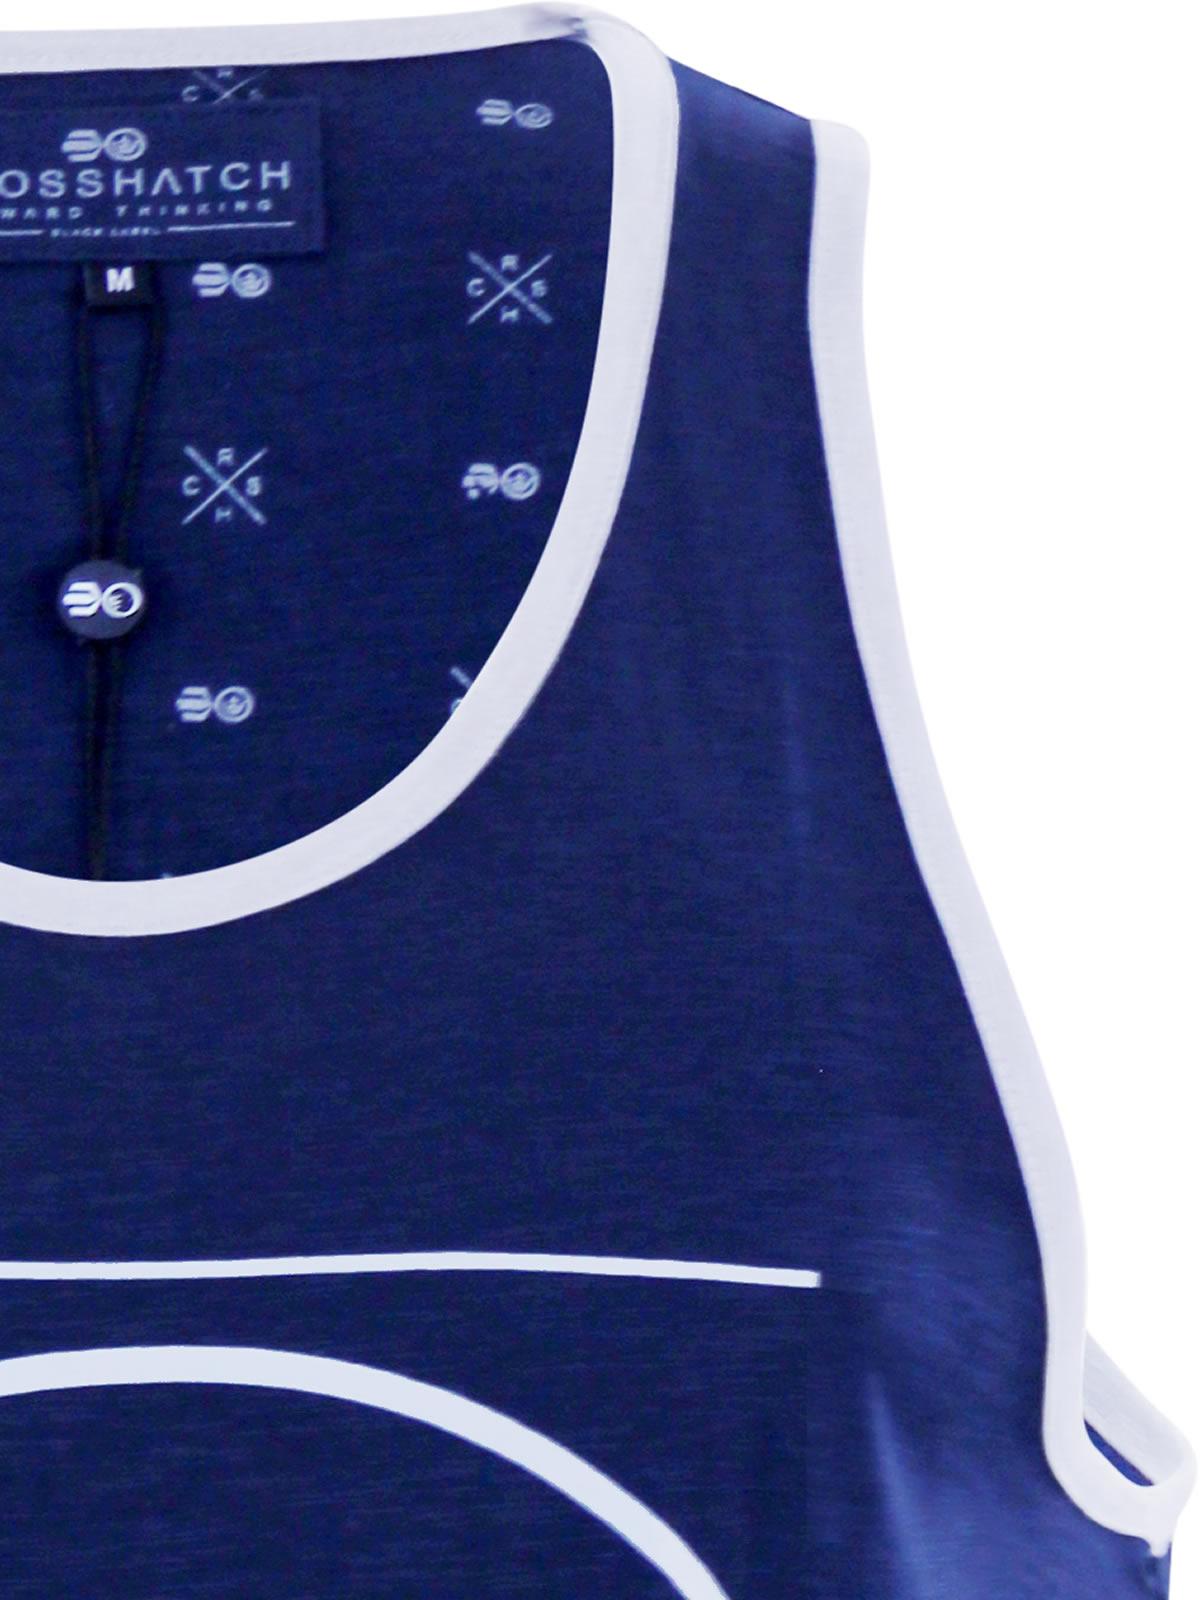 miniature 7 - Homme-debardeur-t-shirt-crosshatch-alfa-summer-muscle-back-tank-top